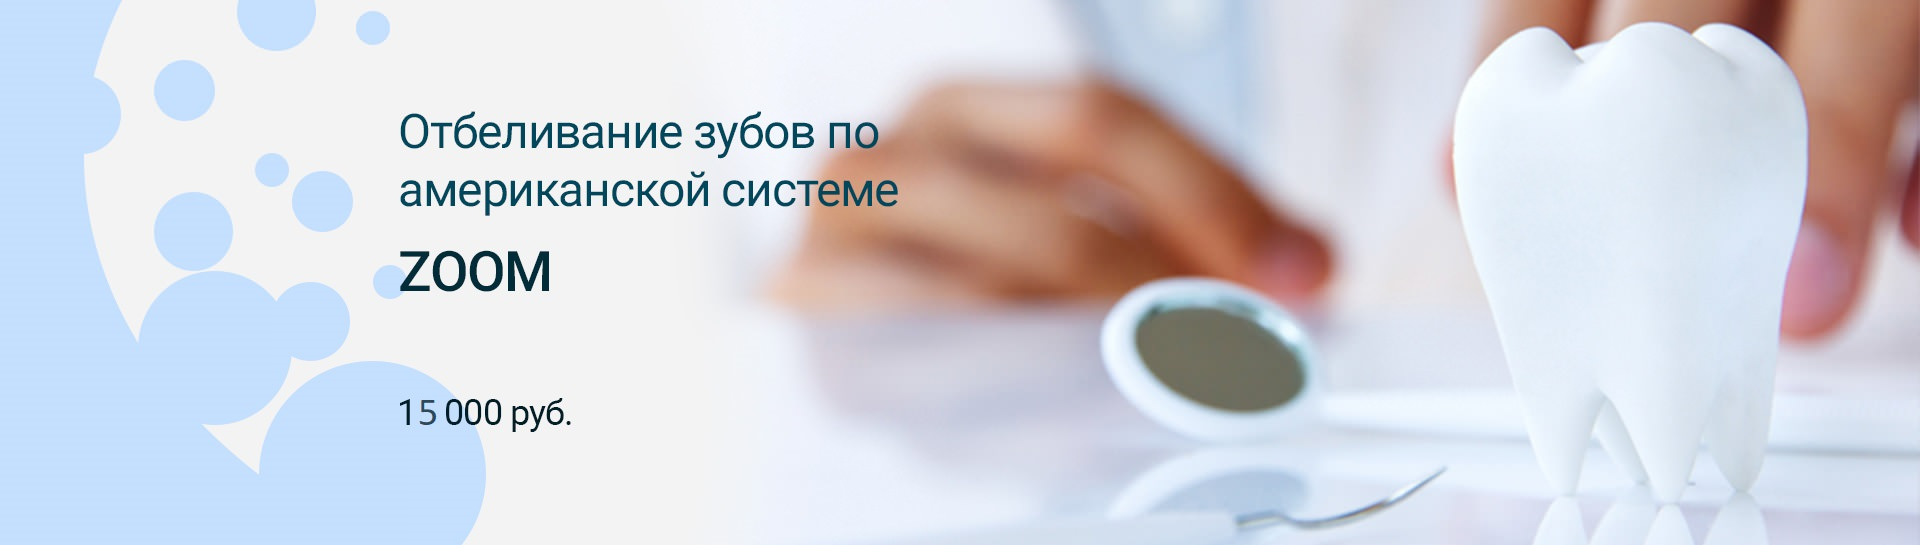 https://denta-maryino.ru/wp-content/uploads/zoom-akcija.jpg 1x, https://denta-maryino.ru/wp-content/cache/thumb/b3/0d7ccc06ceab9b3_1320x545.jpg 1320w